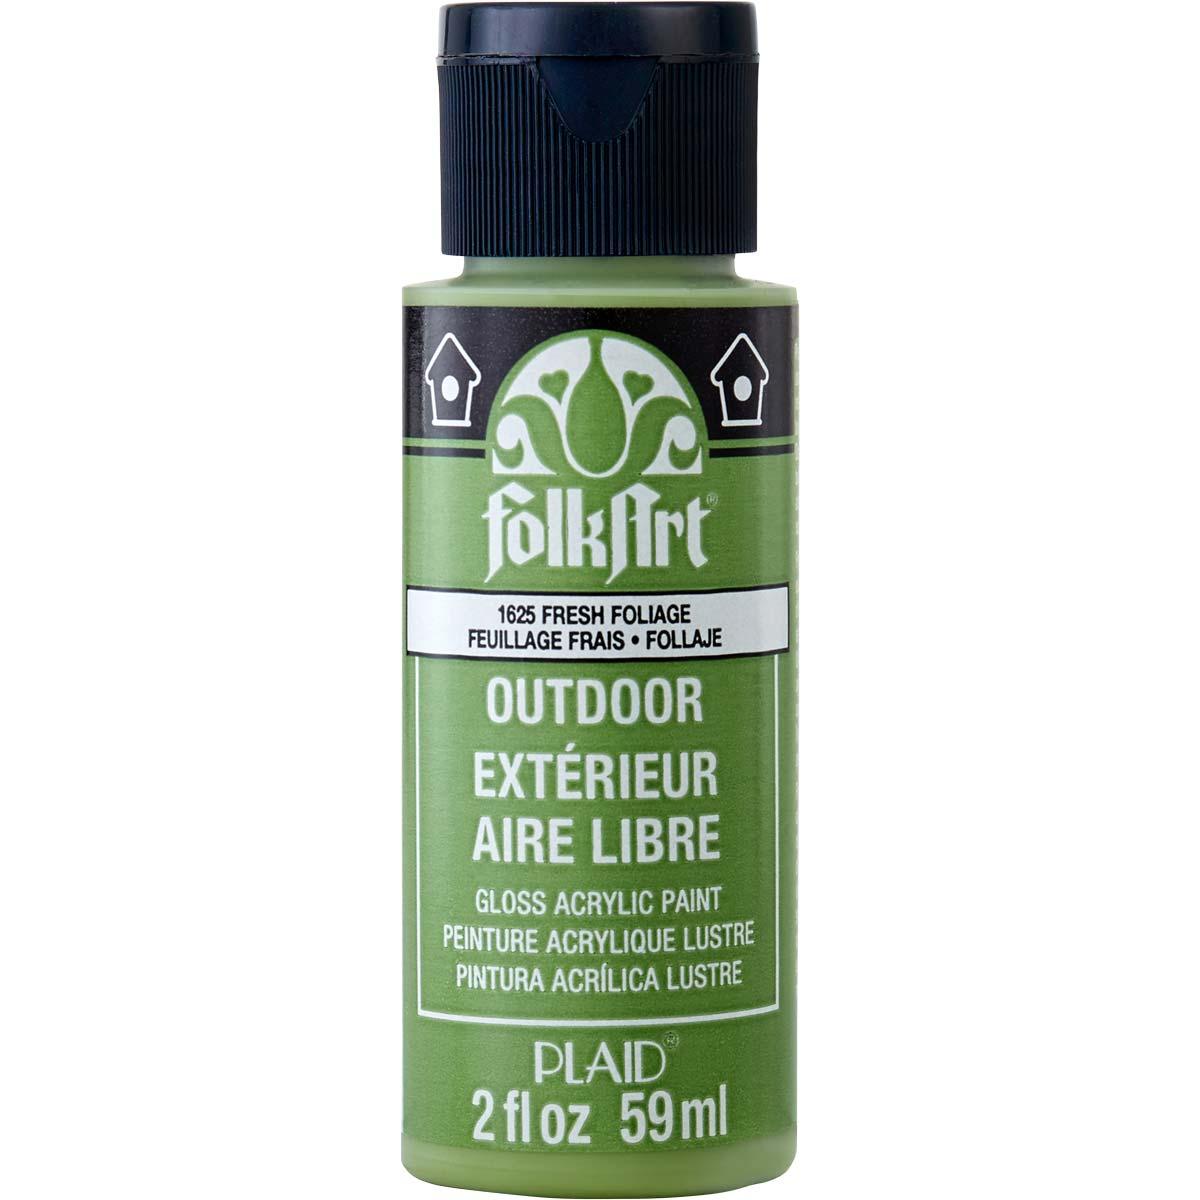 FolkArt ® Outdoor™ Acrylic Colors - Fresh Foliage, 2 oz. - 1625